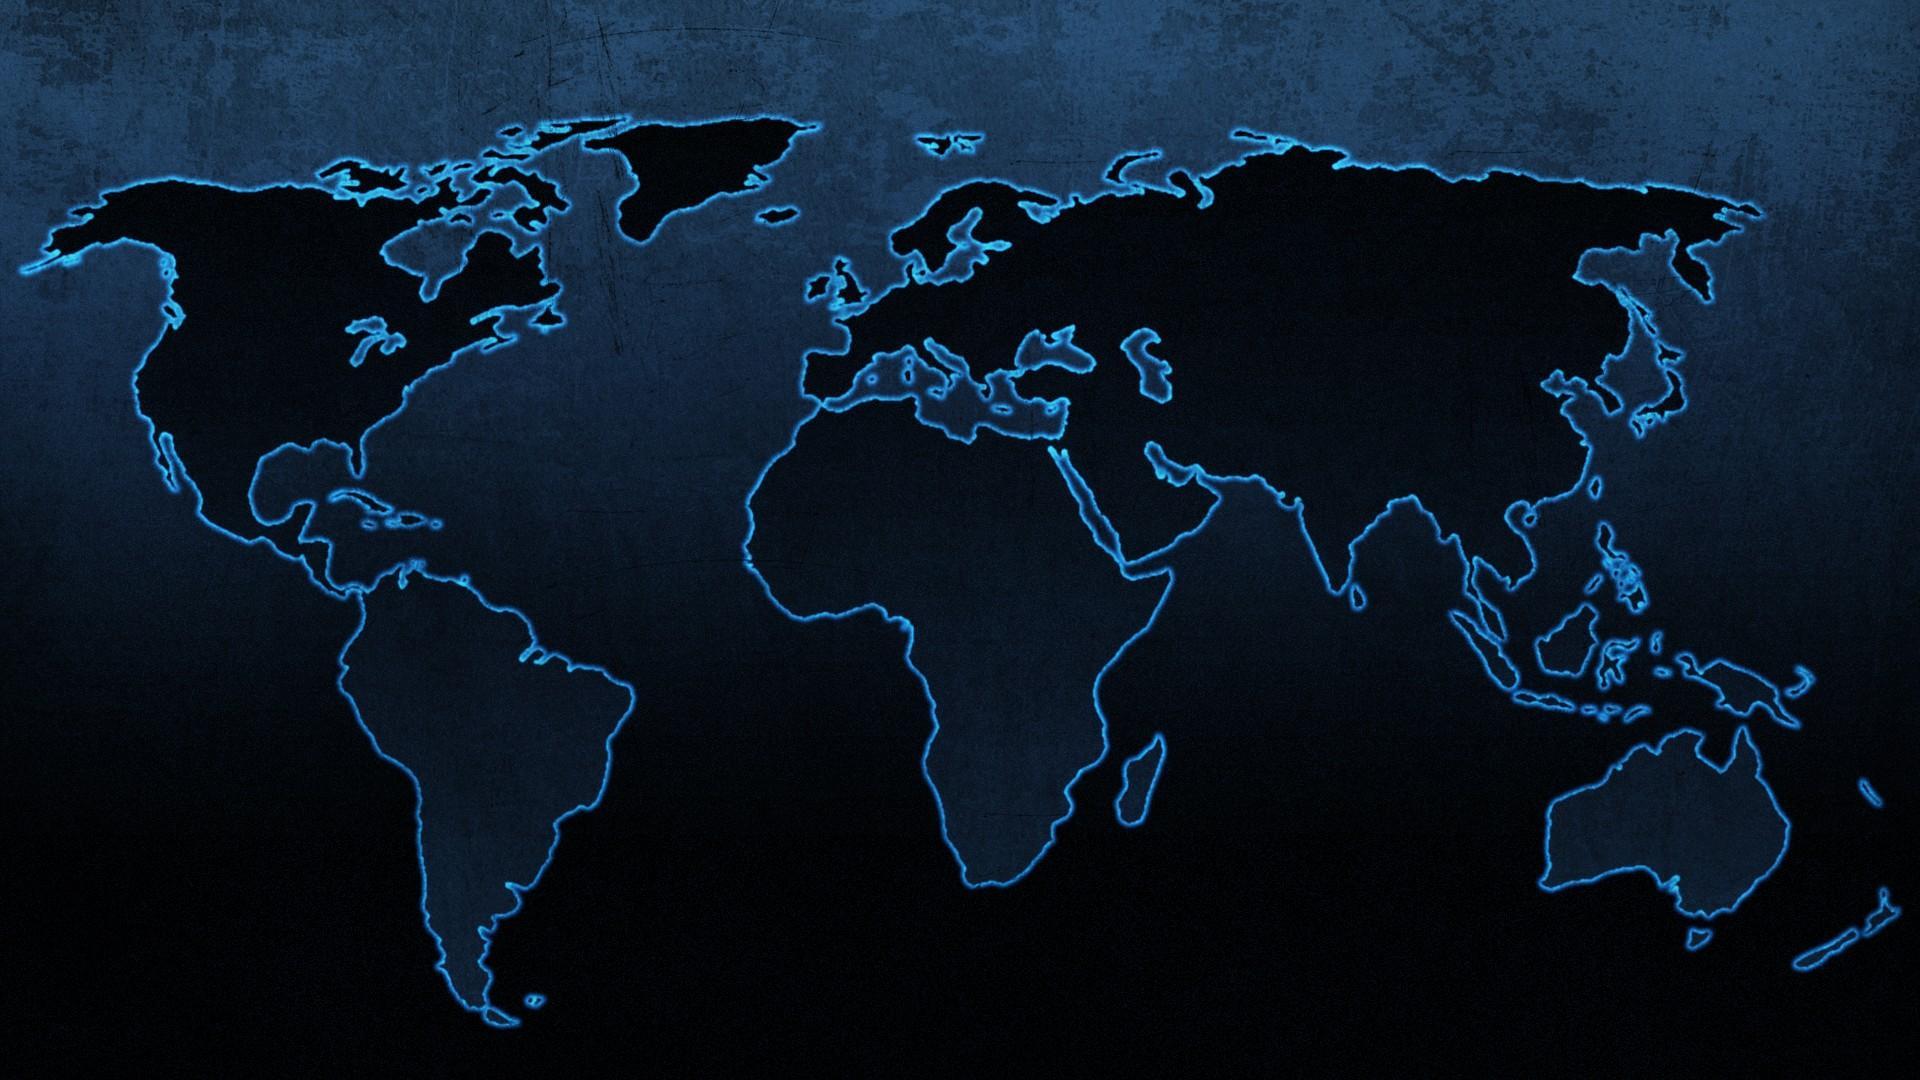 World Map Wallpapers   Best HD Desktop Wallpapers  Widescreen. Desktop Wallpaper World Map   WallpaperSafari